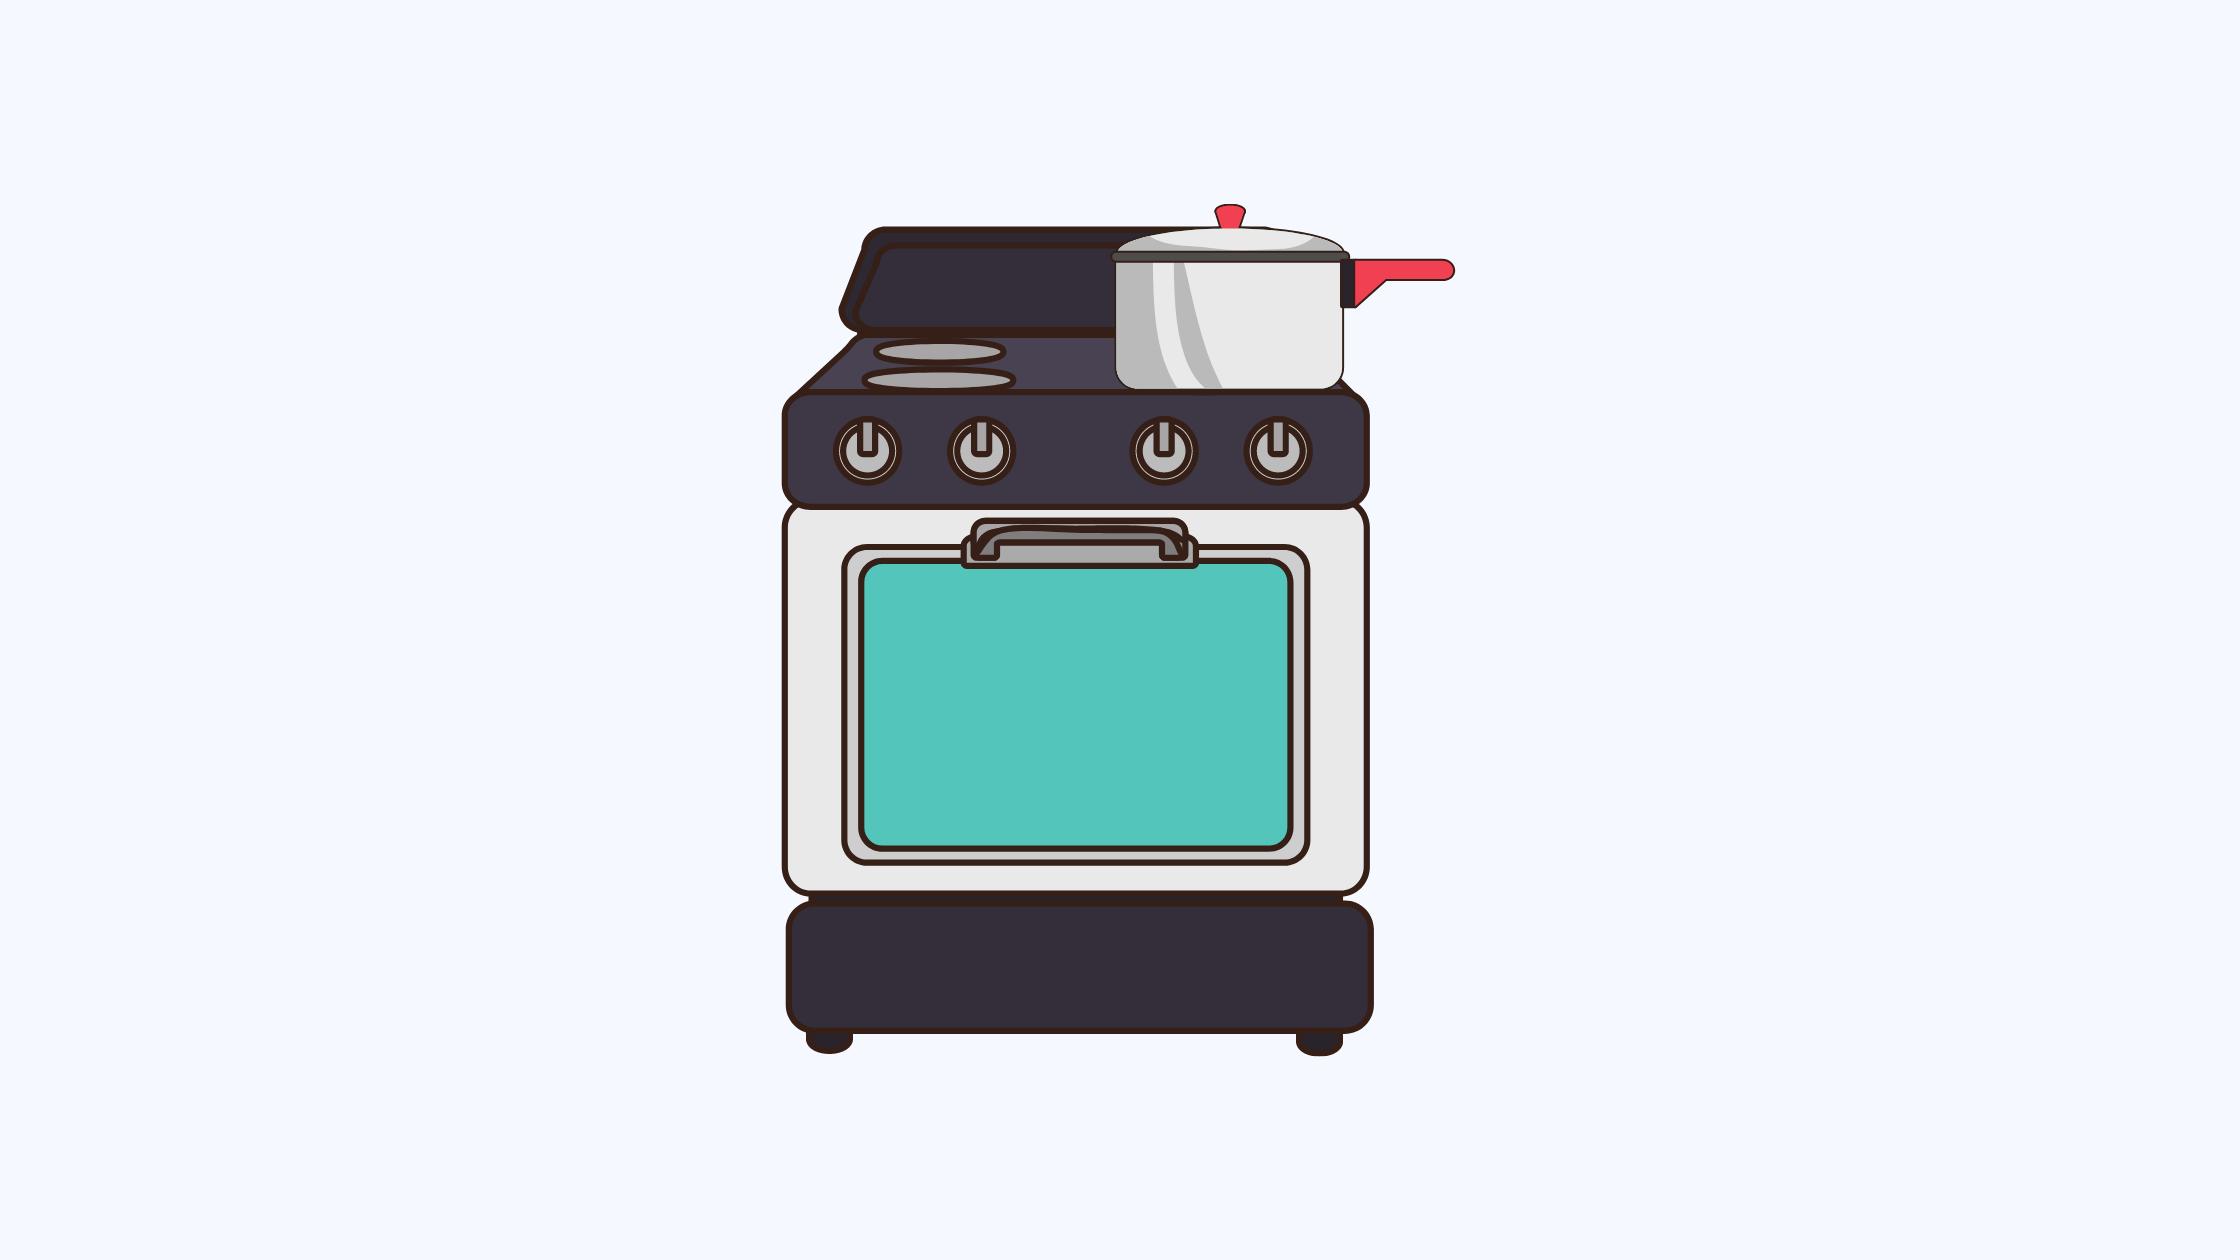 hot stove rule